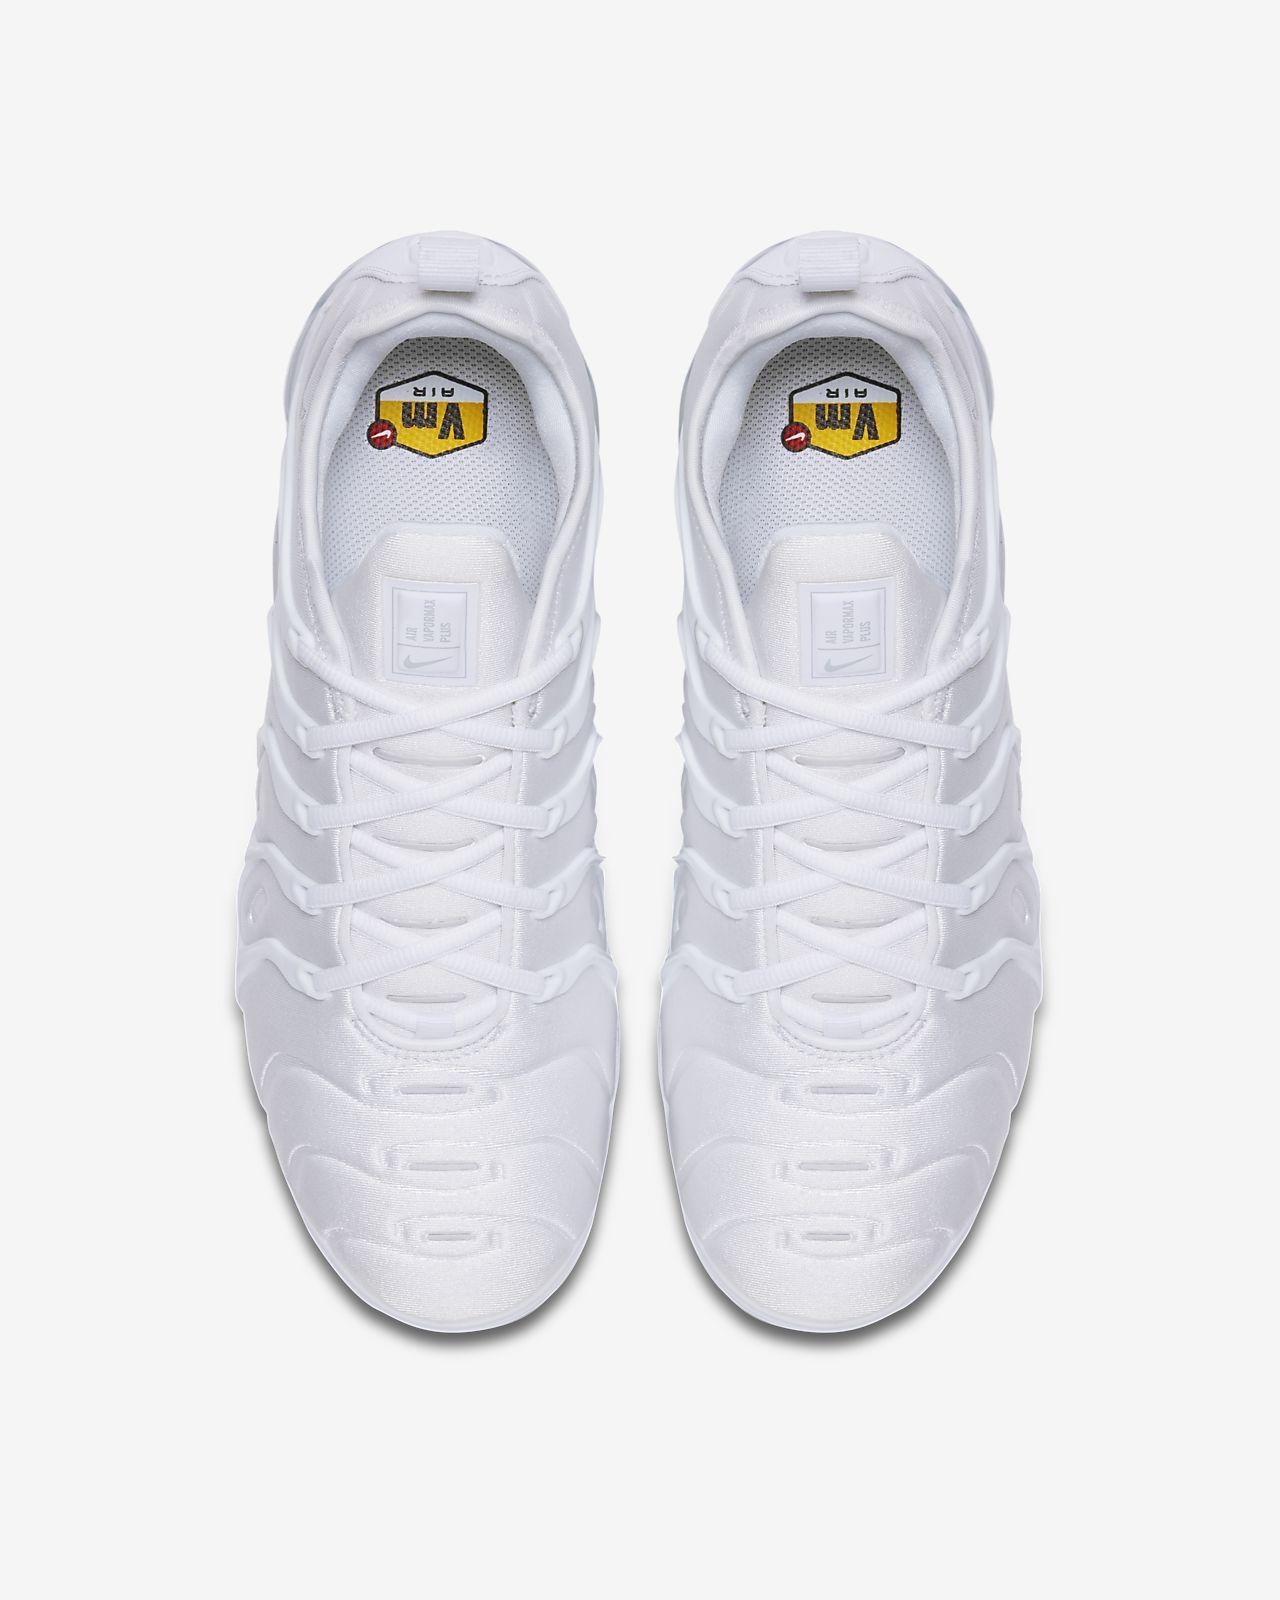 finest selection b93cb 45148 Nike Air VaporMax Plus Men's Shoe. Nike.com